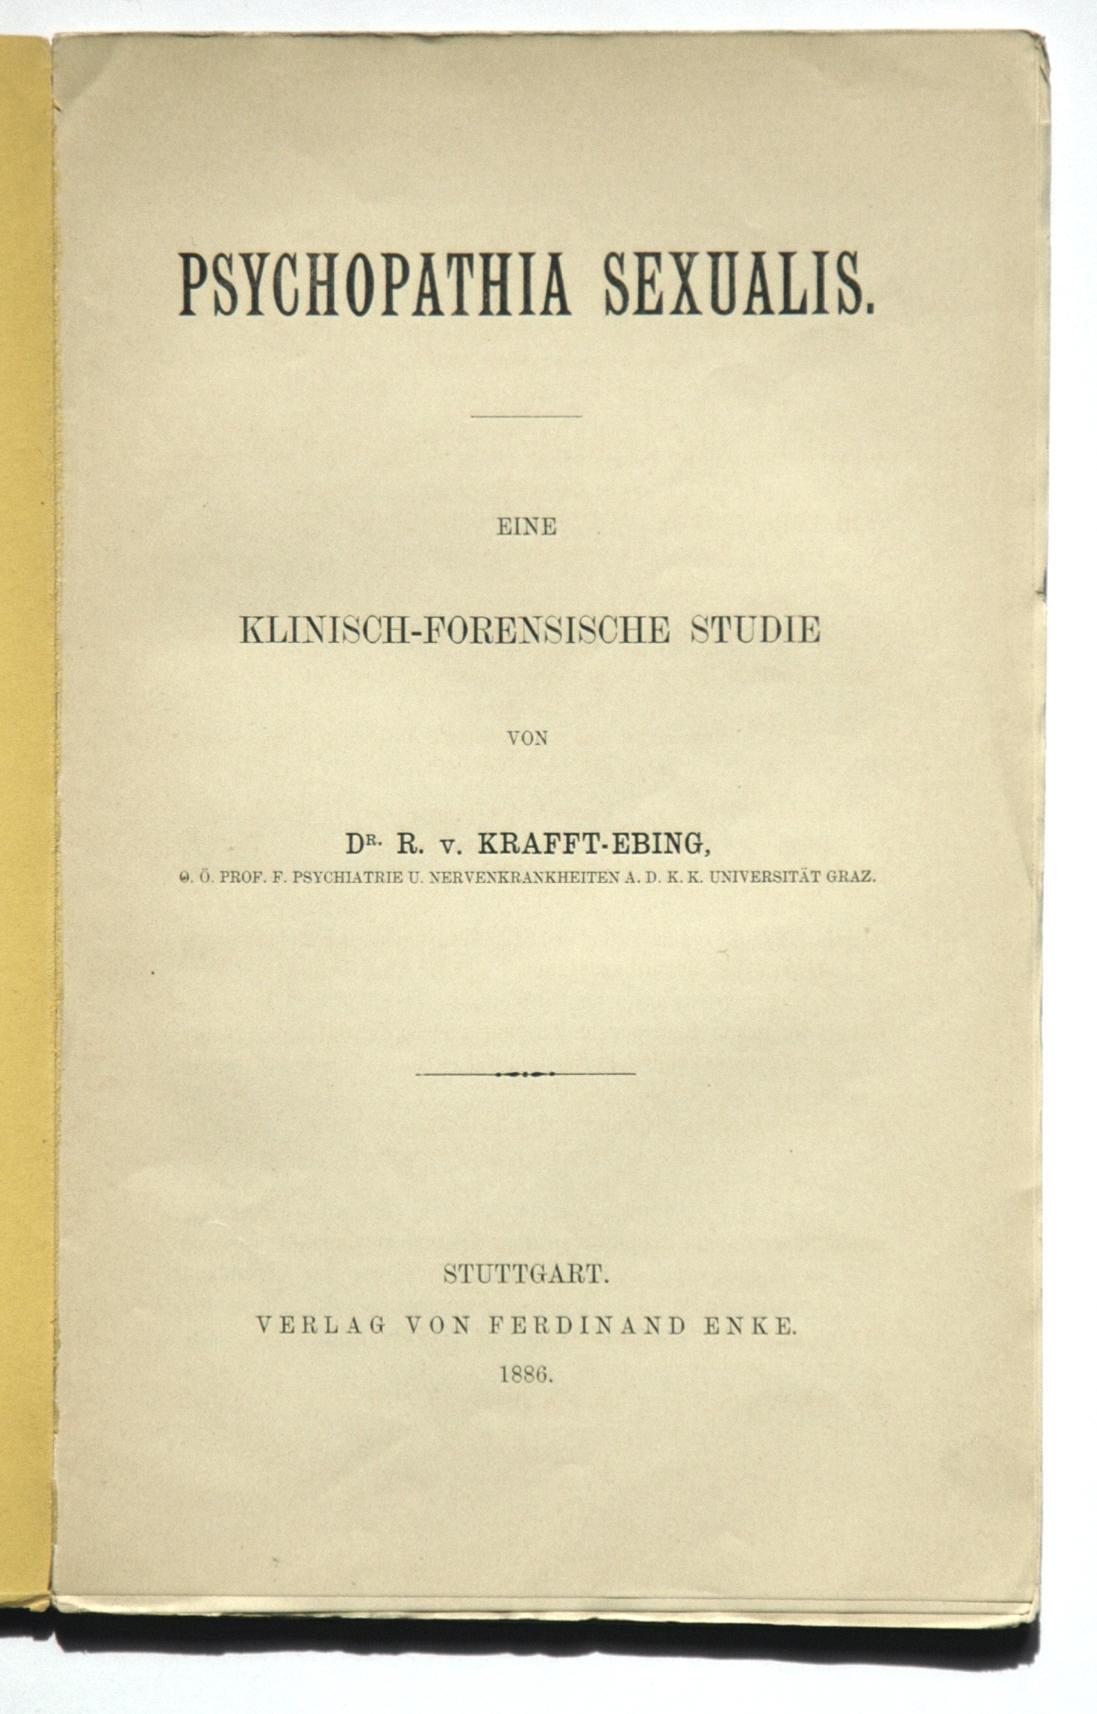 Psychopathia sexualis (Krafft-Ebing) – Wikipedia